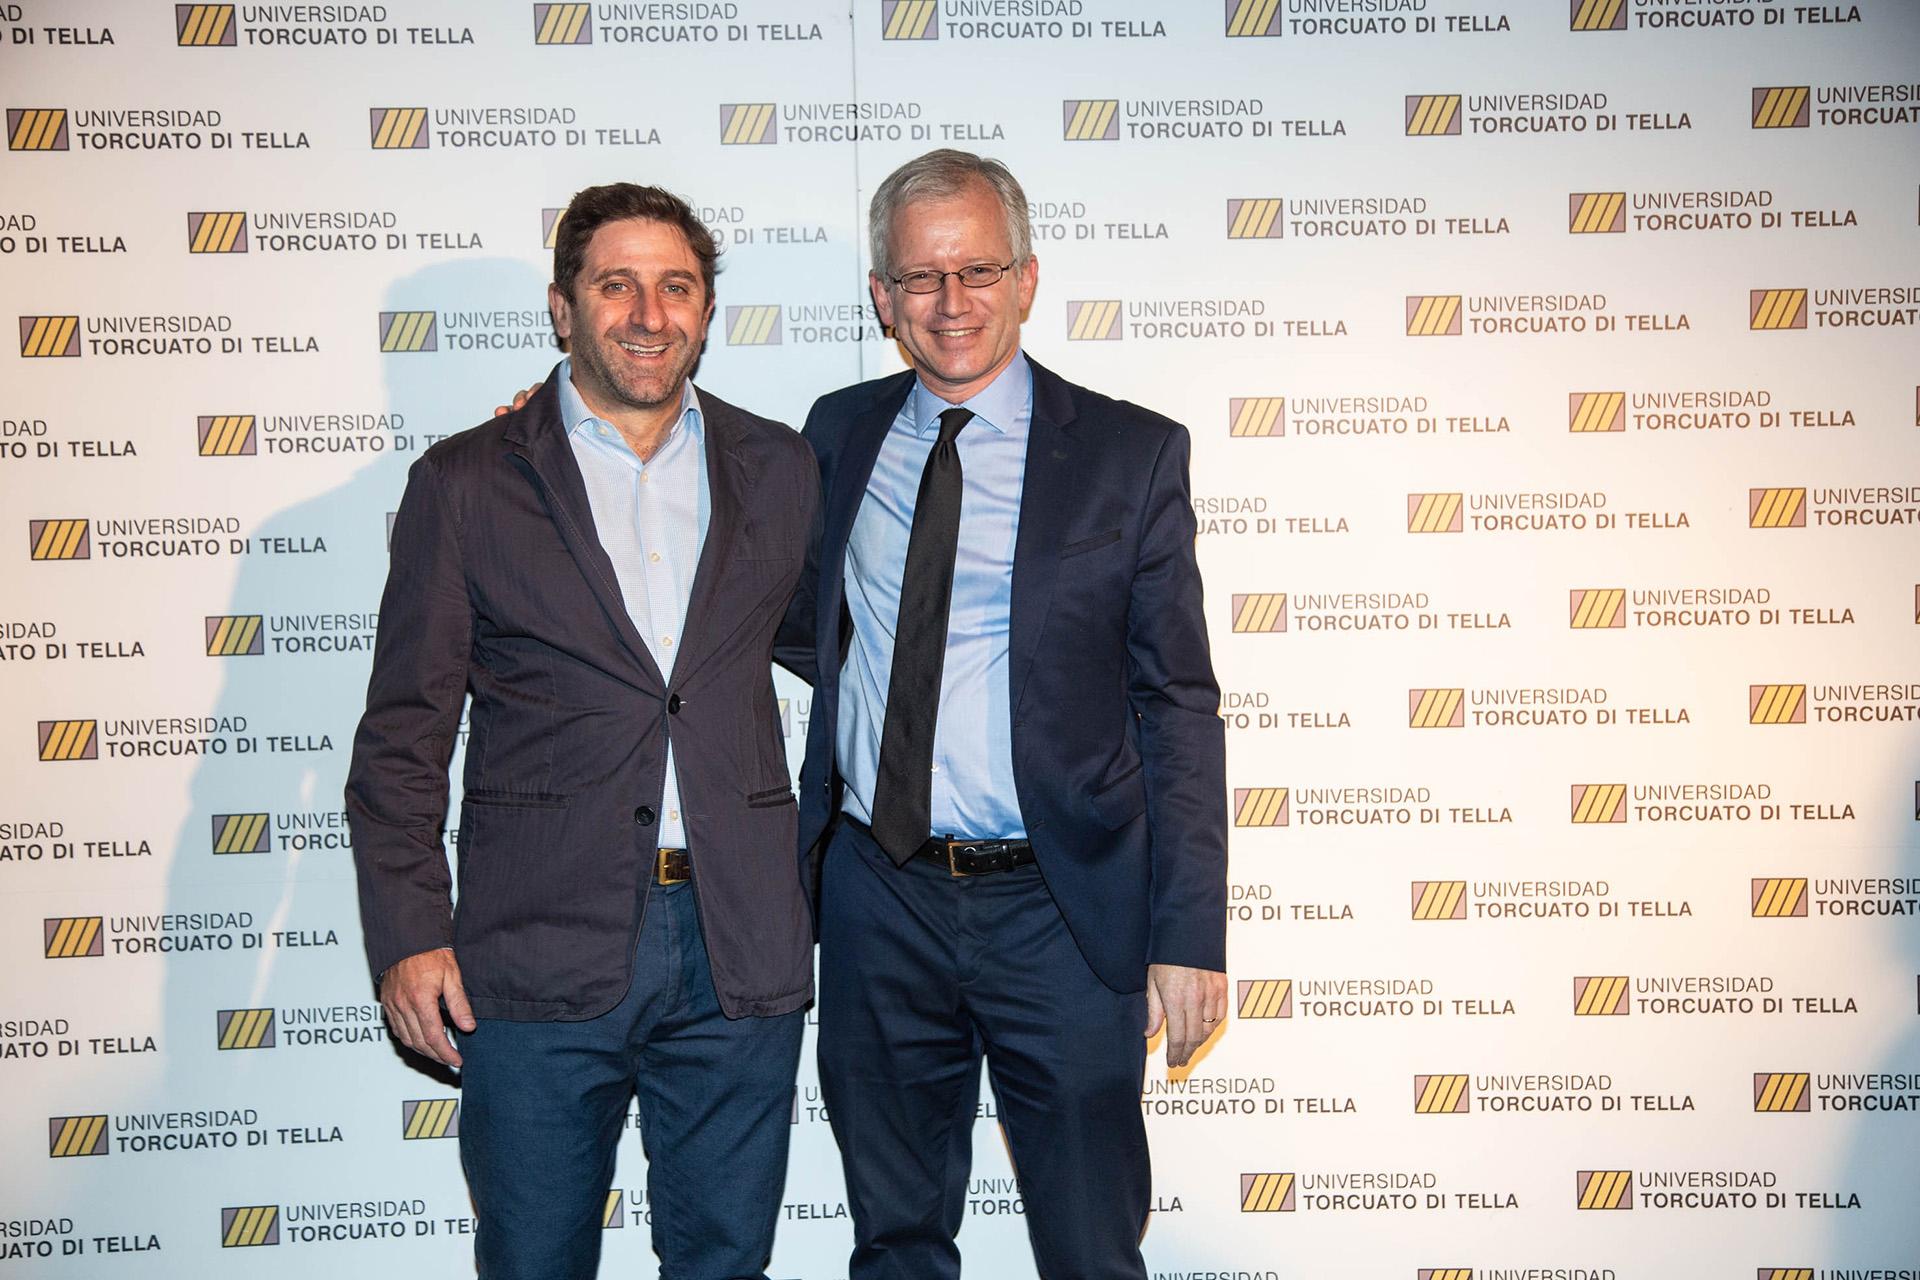 Fernando Straface y Ernesto Schargrodsky